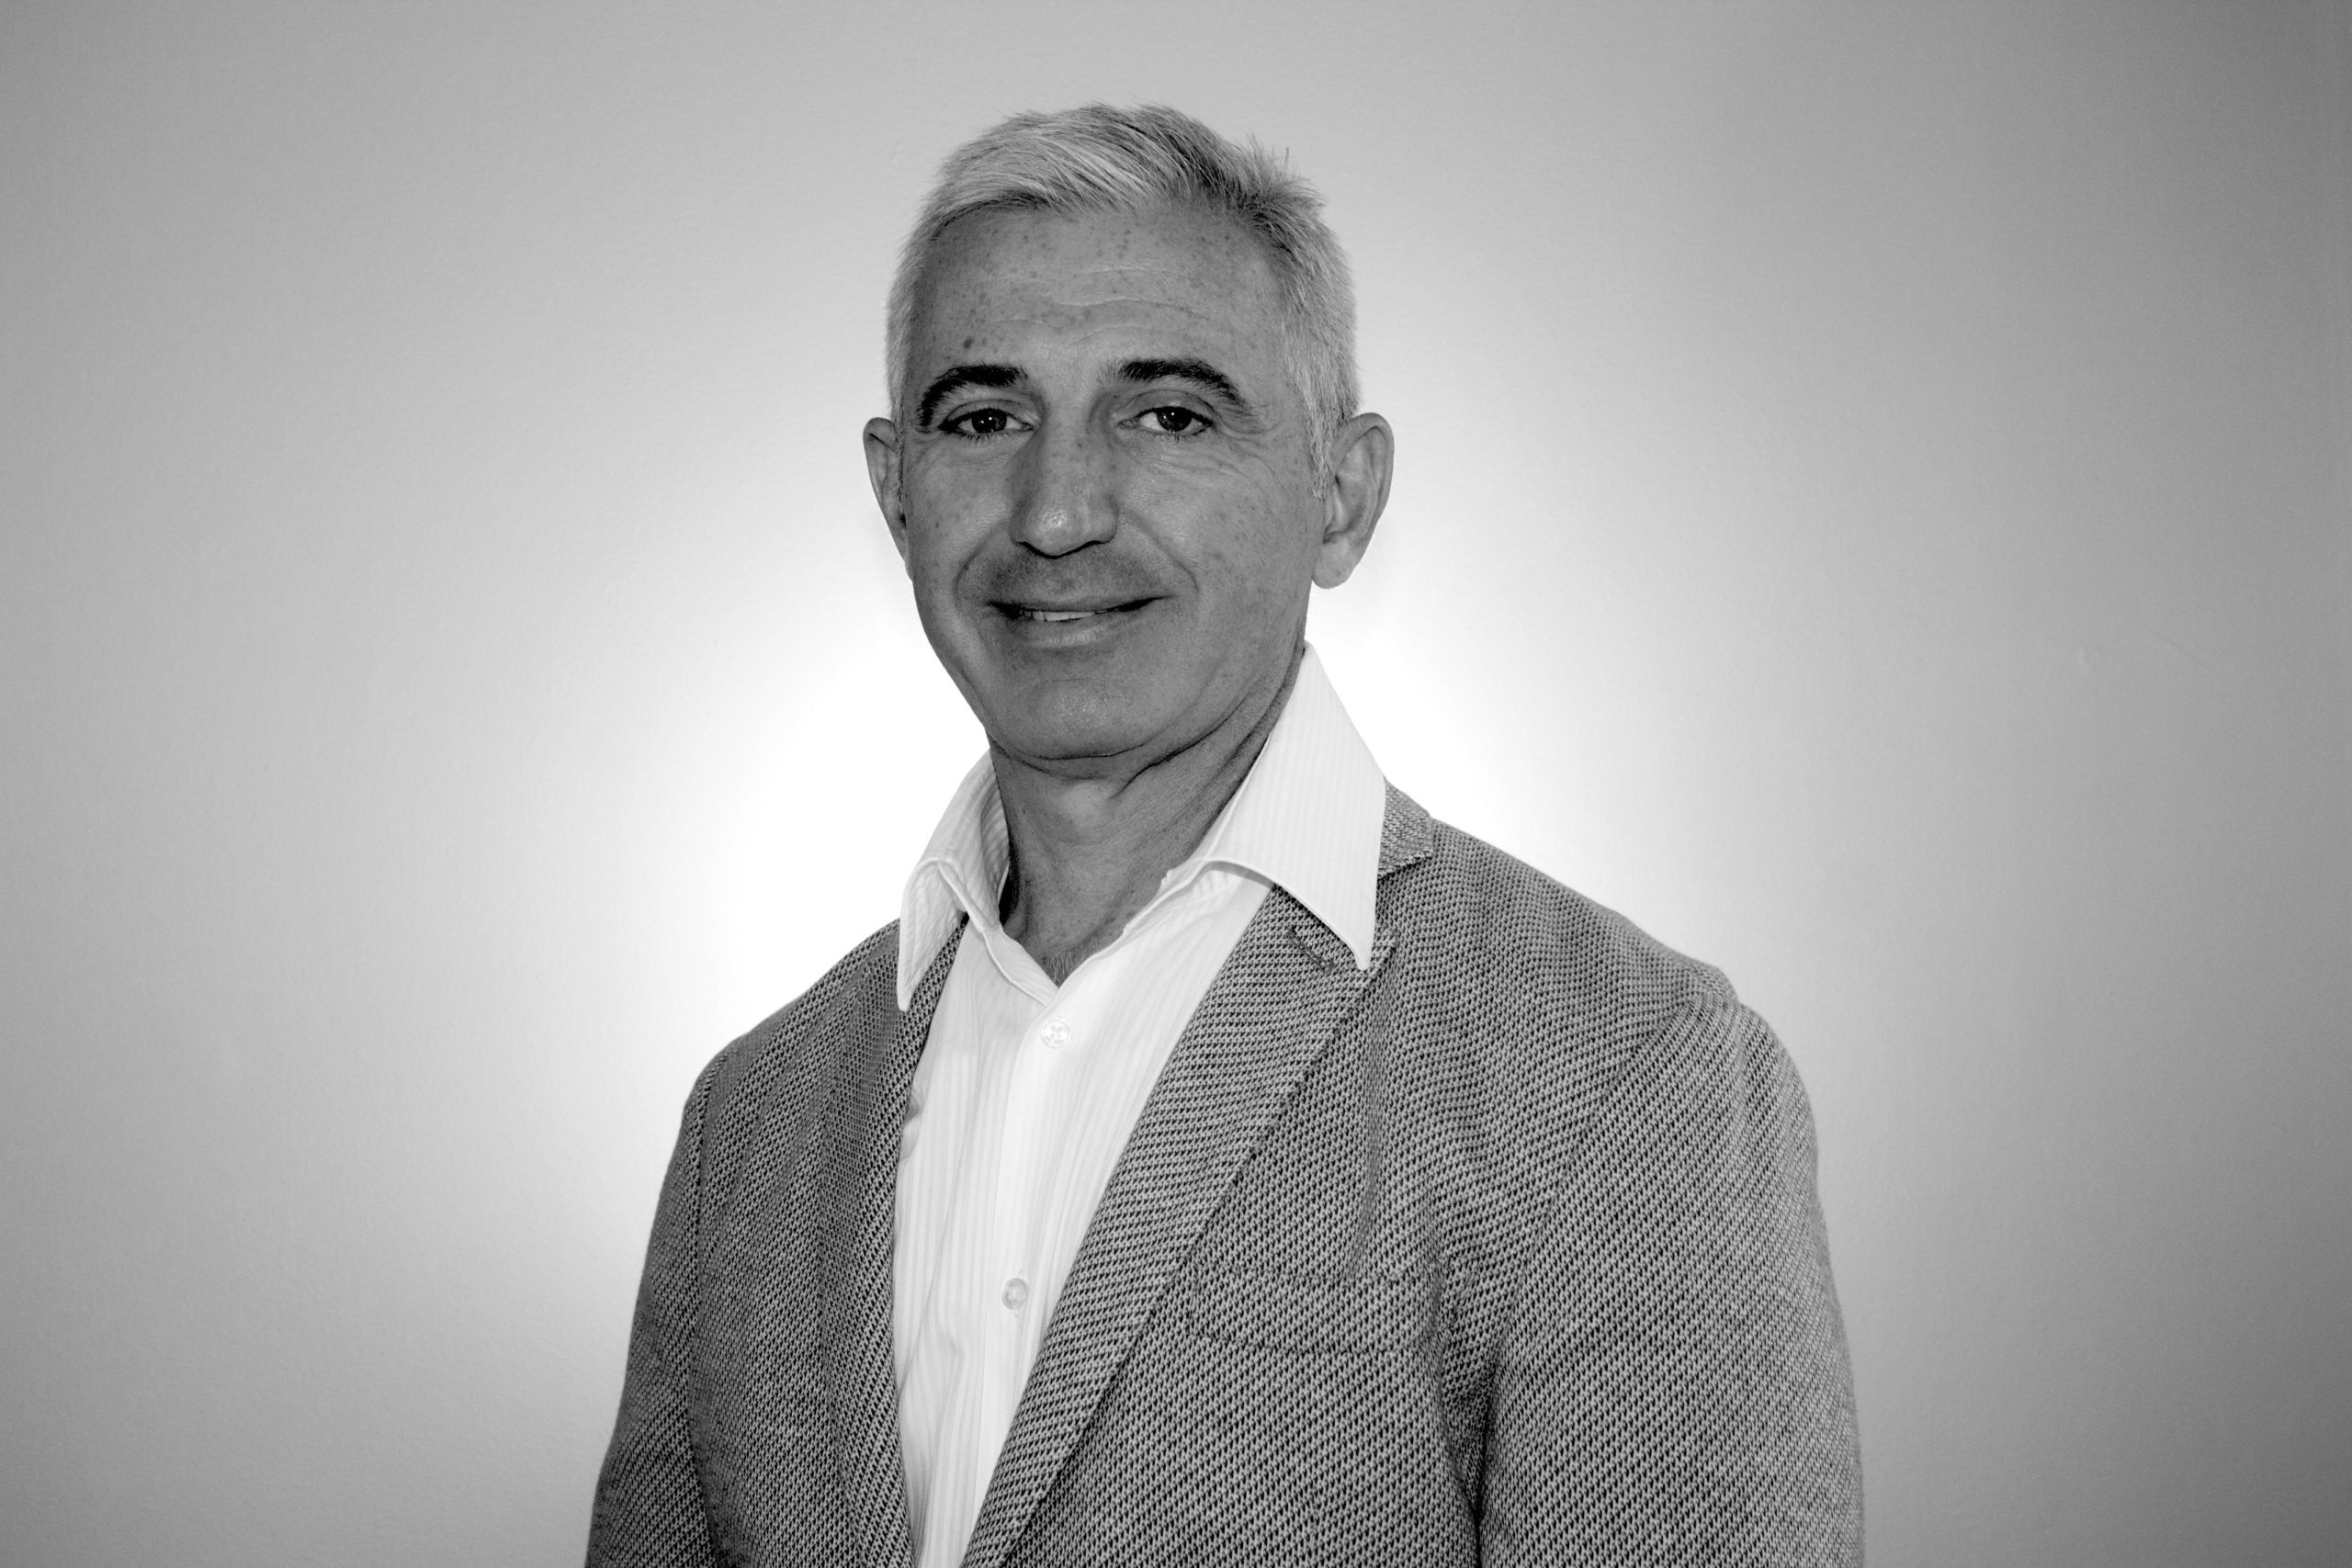 Mario_Tata